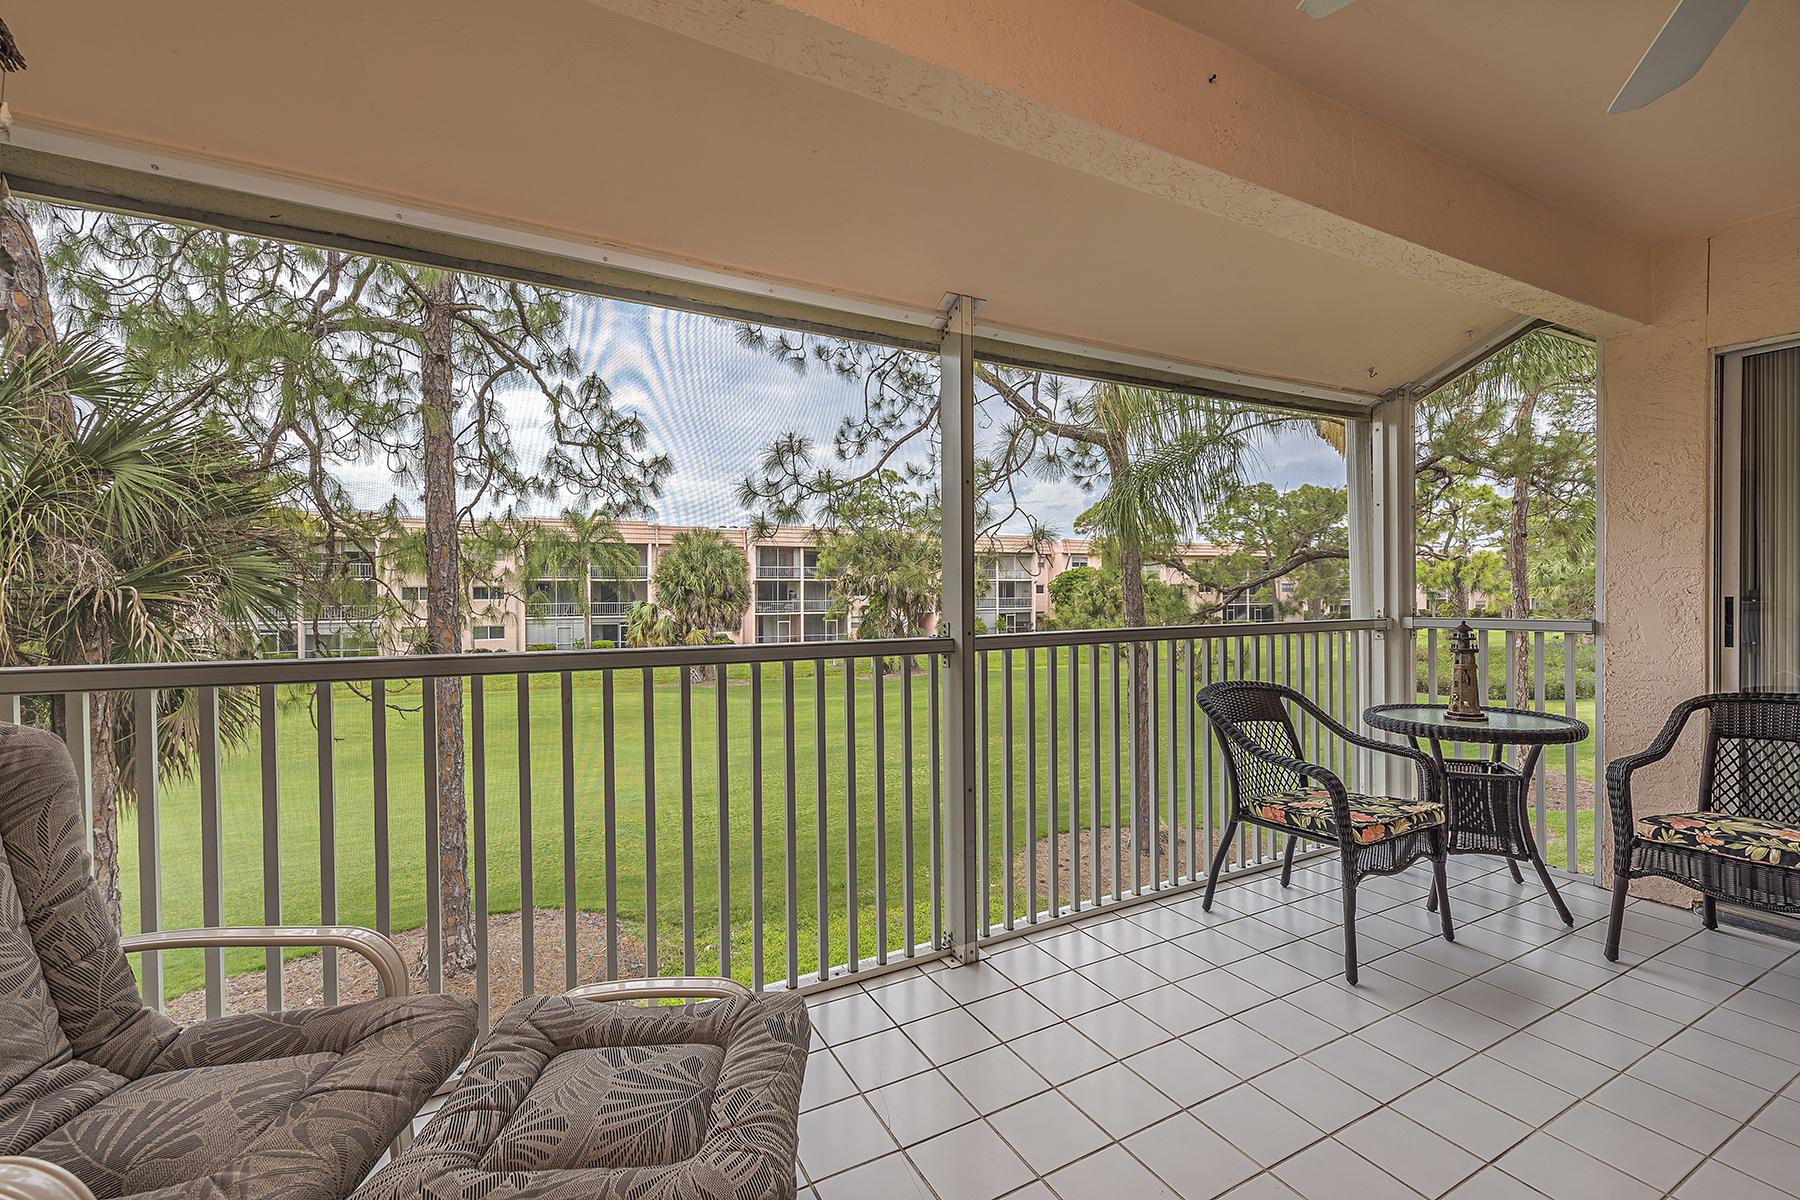 共管物業 為 出售 在 Forest Lakes 576 Woodshire Ln F6 Naples, 佛羅里達州, 34105 美國